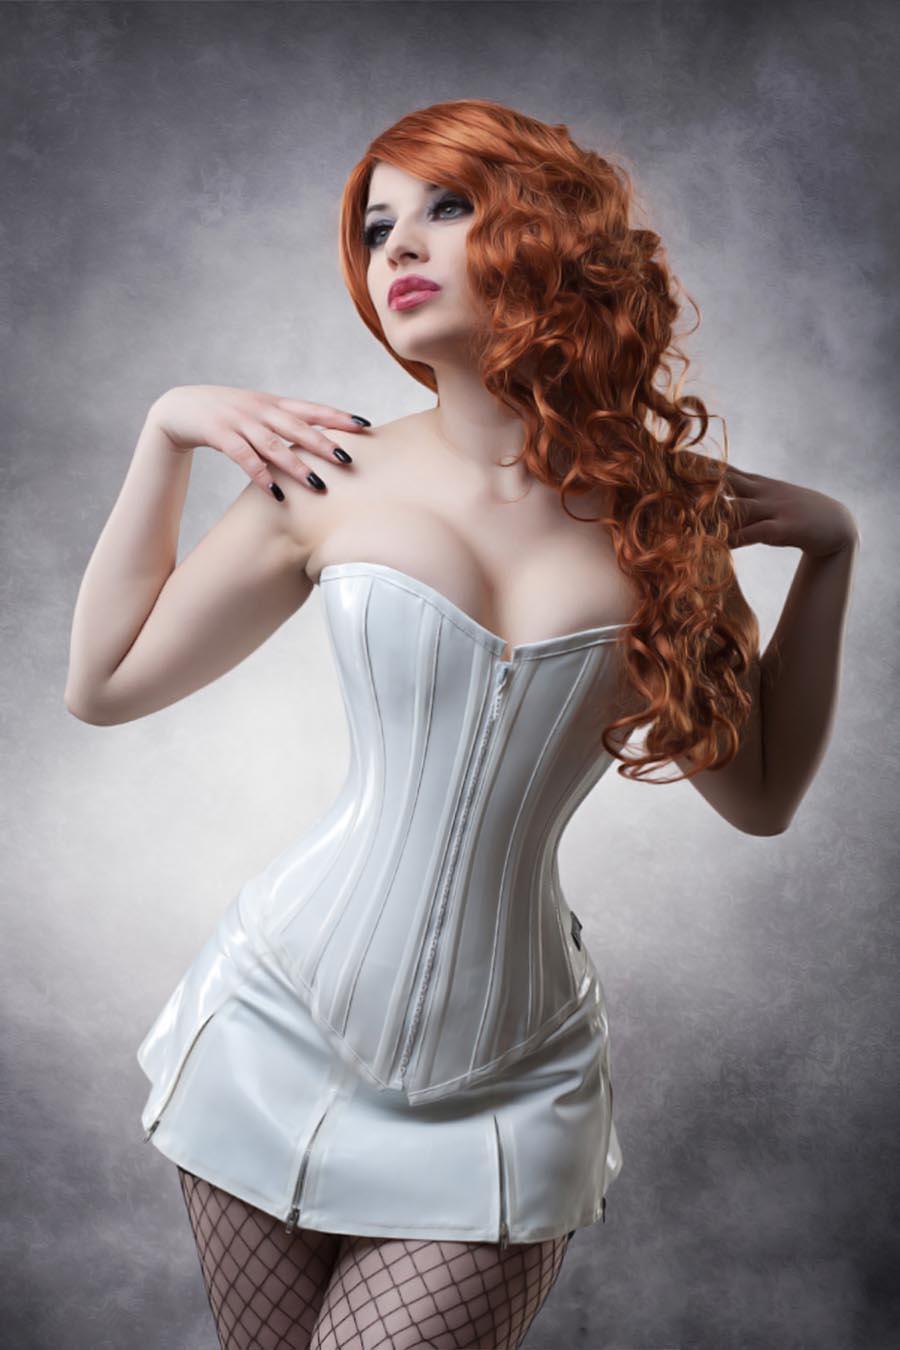 sexy+tight+corset+(29).jpg